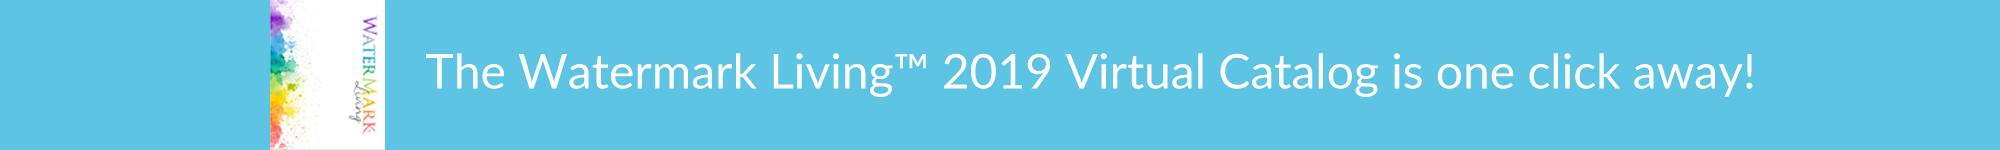 2019-catalog-banner-0100518-copy.jpg